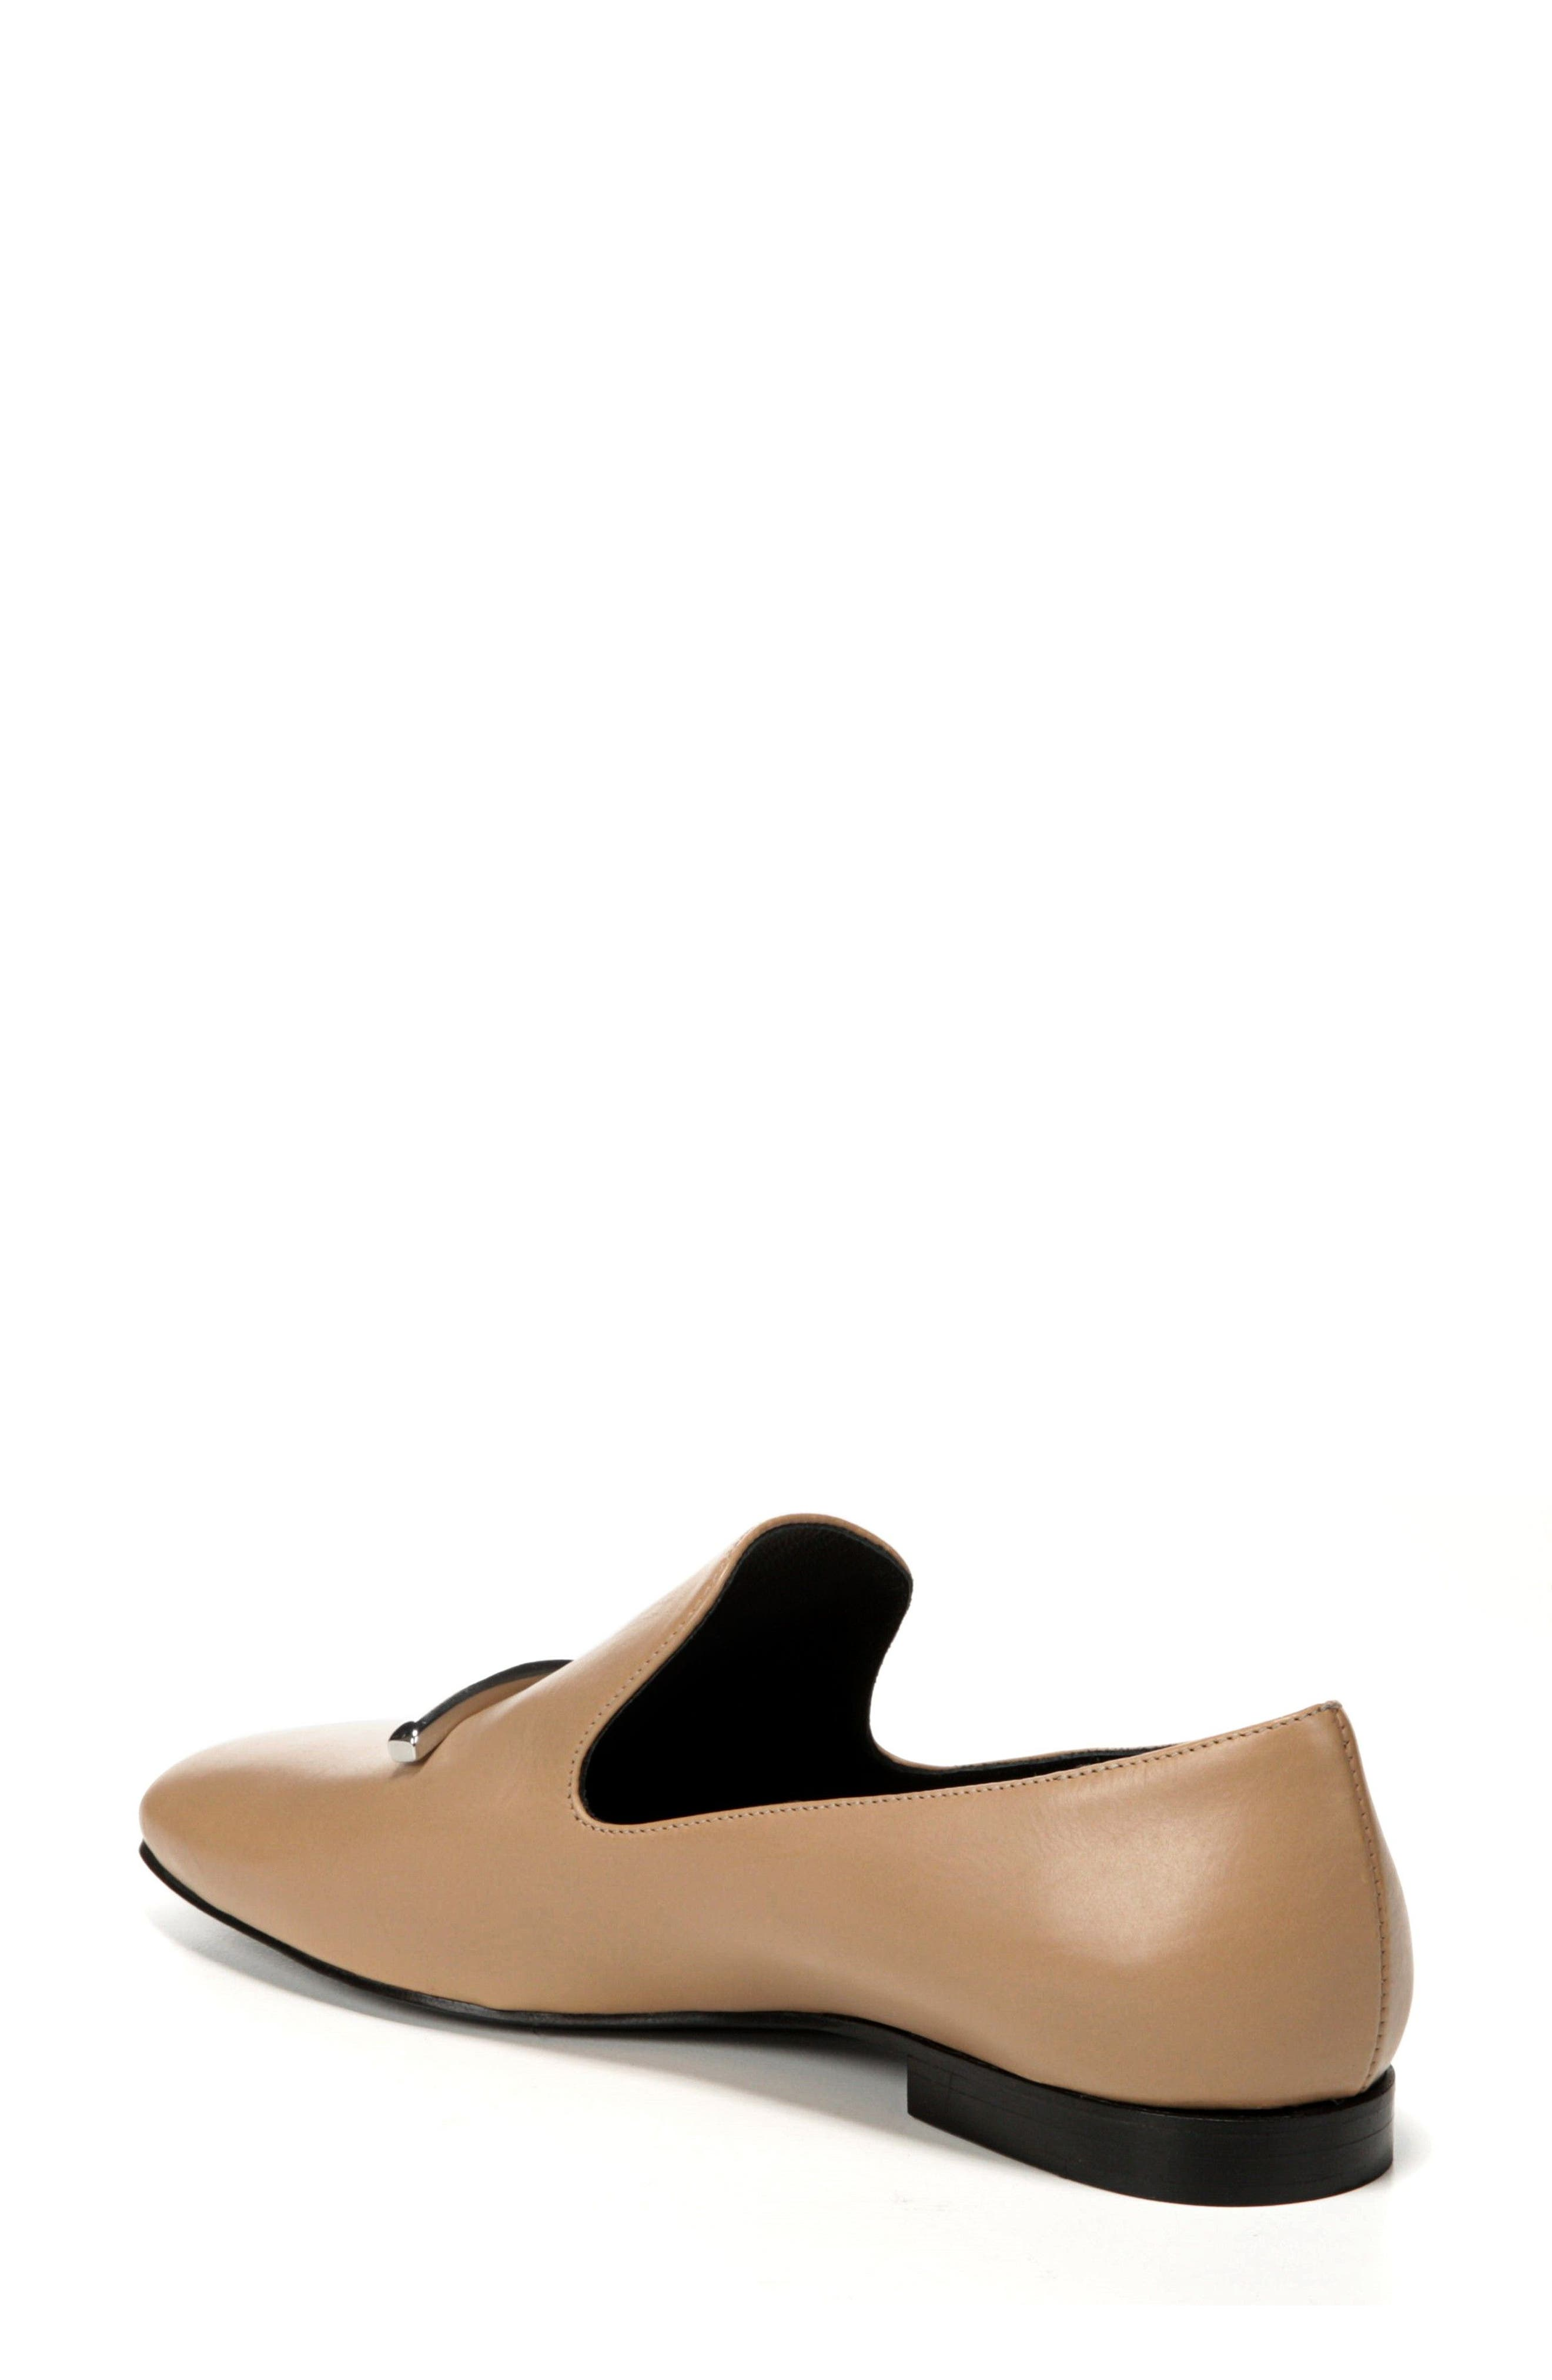 VIA SPIGA, Tallis Flat Loafer, Alternate thumbnail 2, color, 250